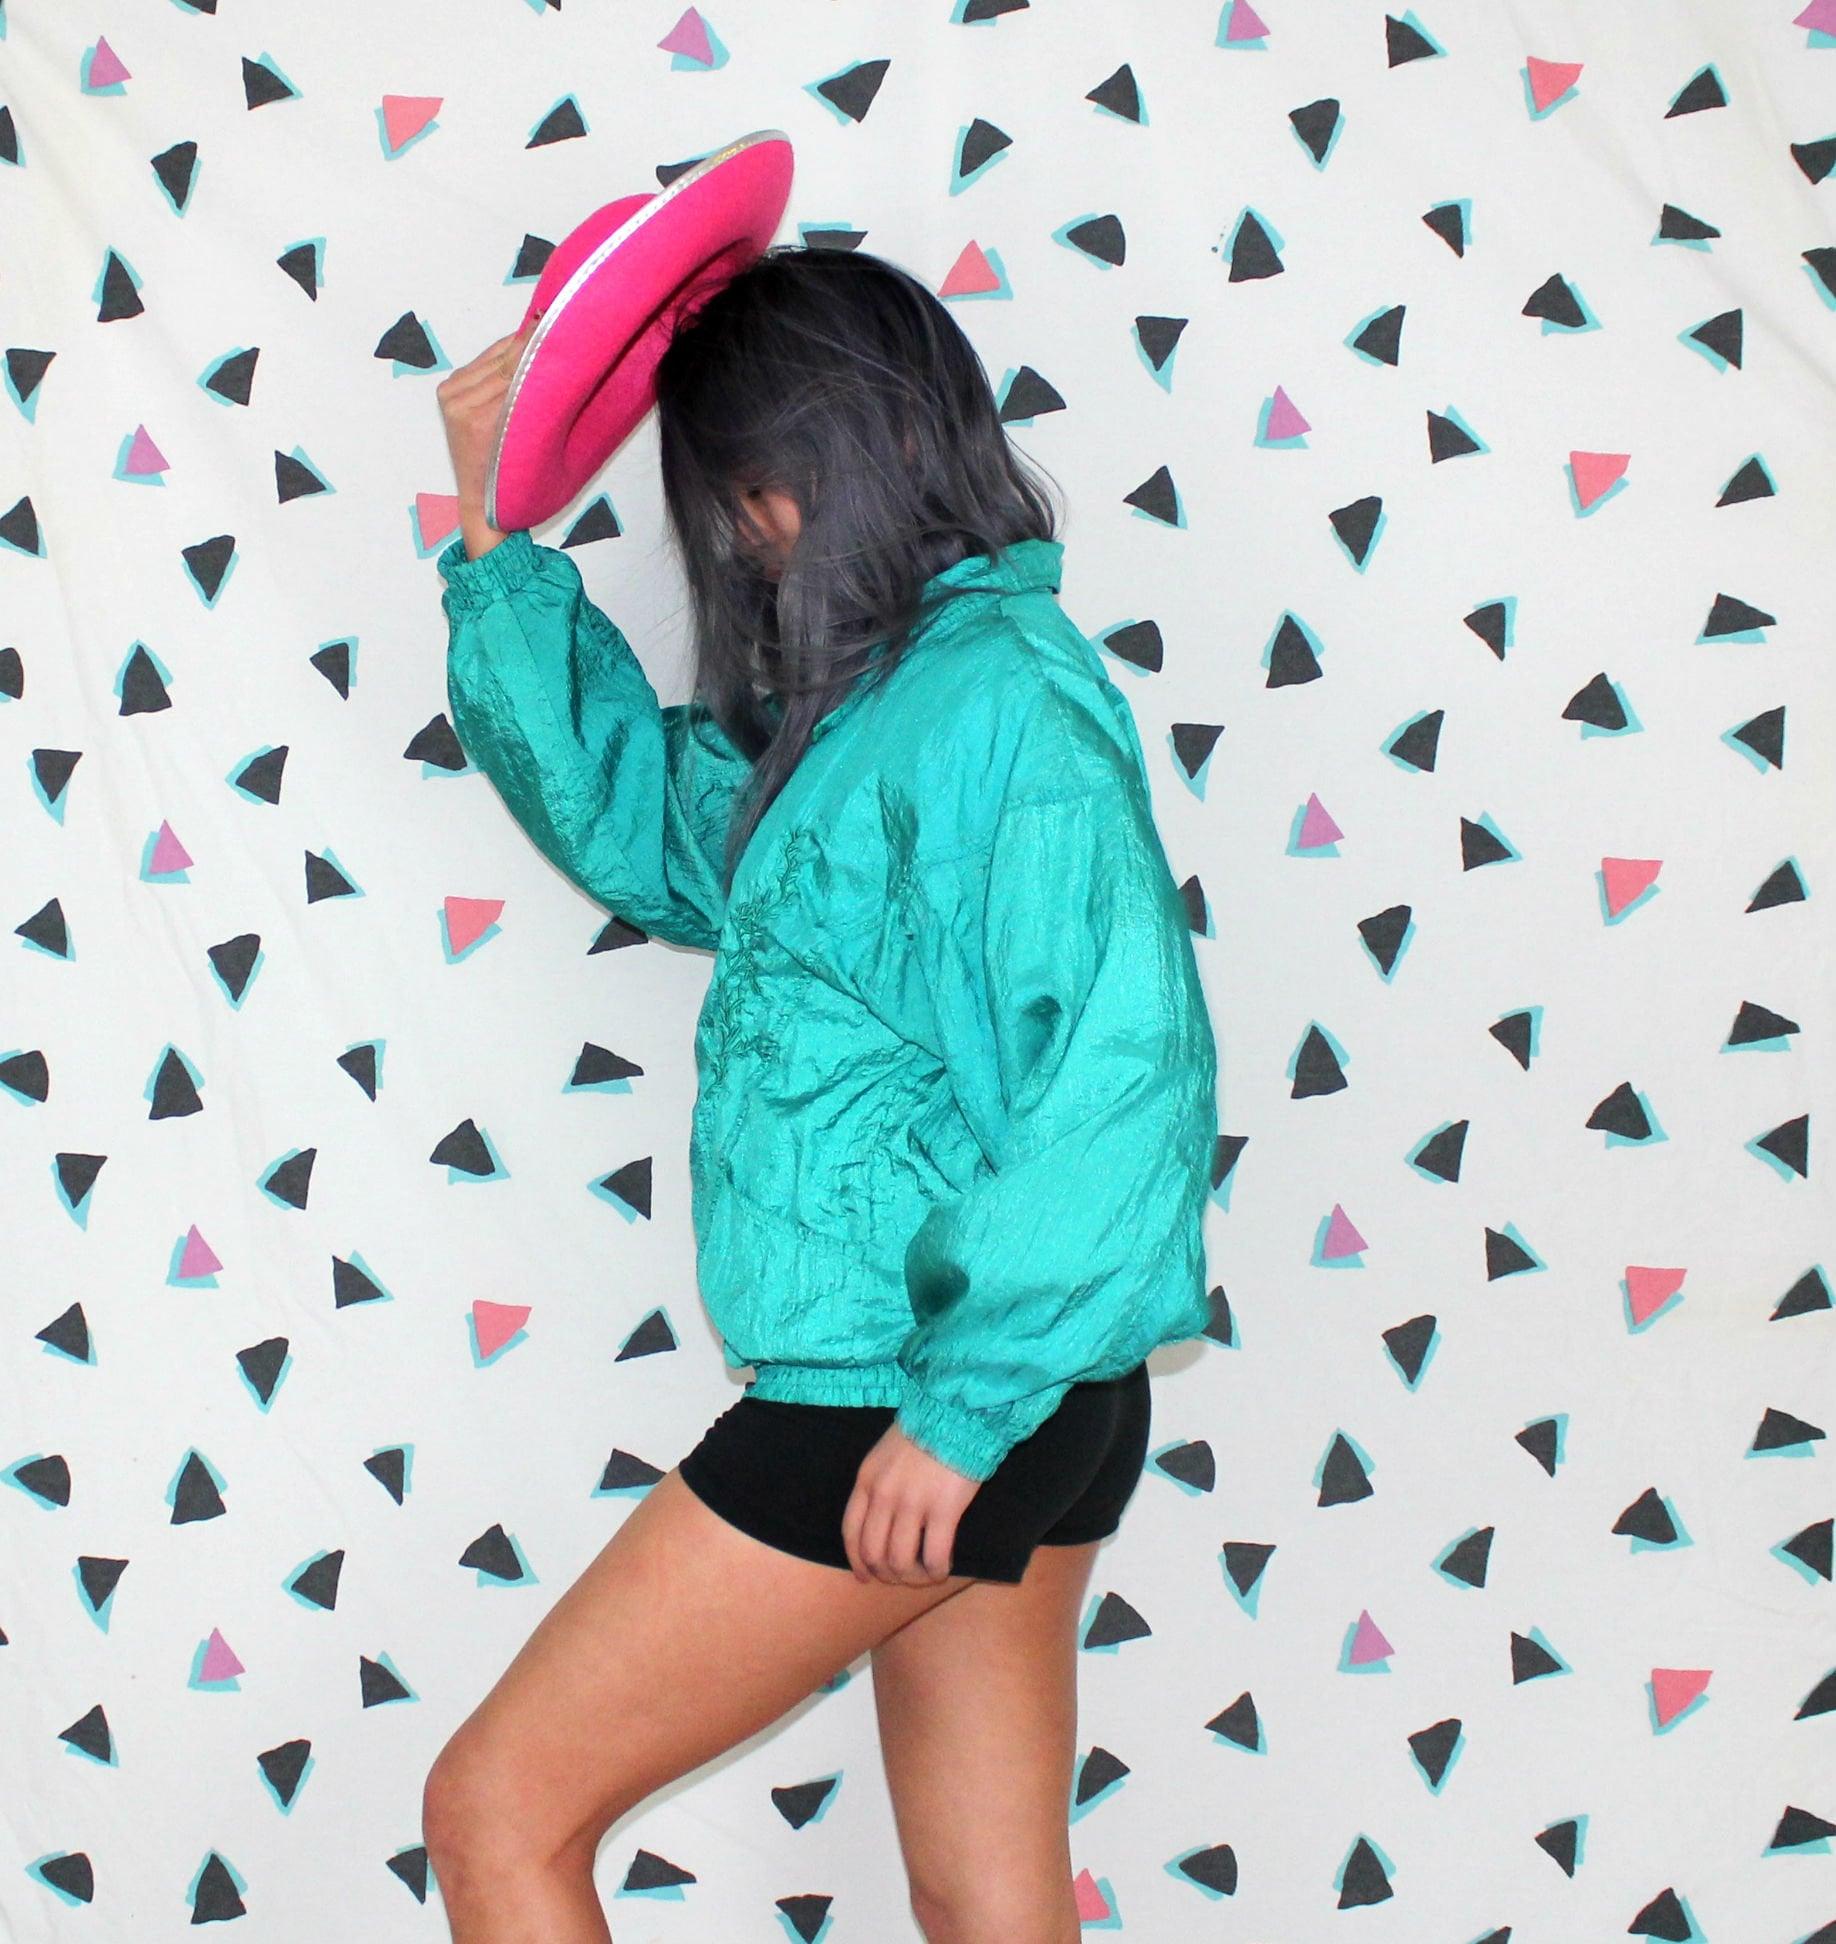 6871075ef58 Retro 80s Or 90s Womens Hip Hop Windbreaker Bomber Jacket. Vintage Mint  Neon Seafoam Green 80s Nylon Bomber Zip Up Jacket. 90s Hip Hop